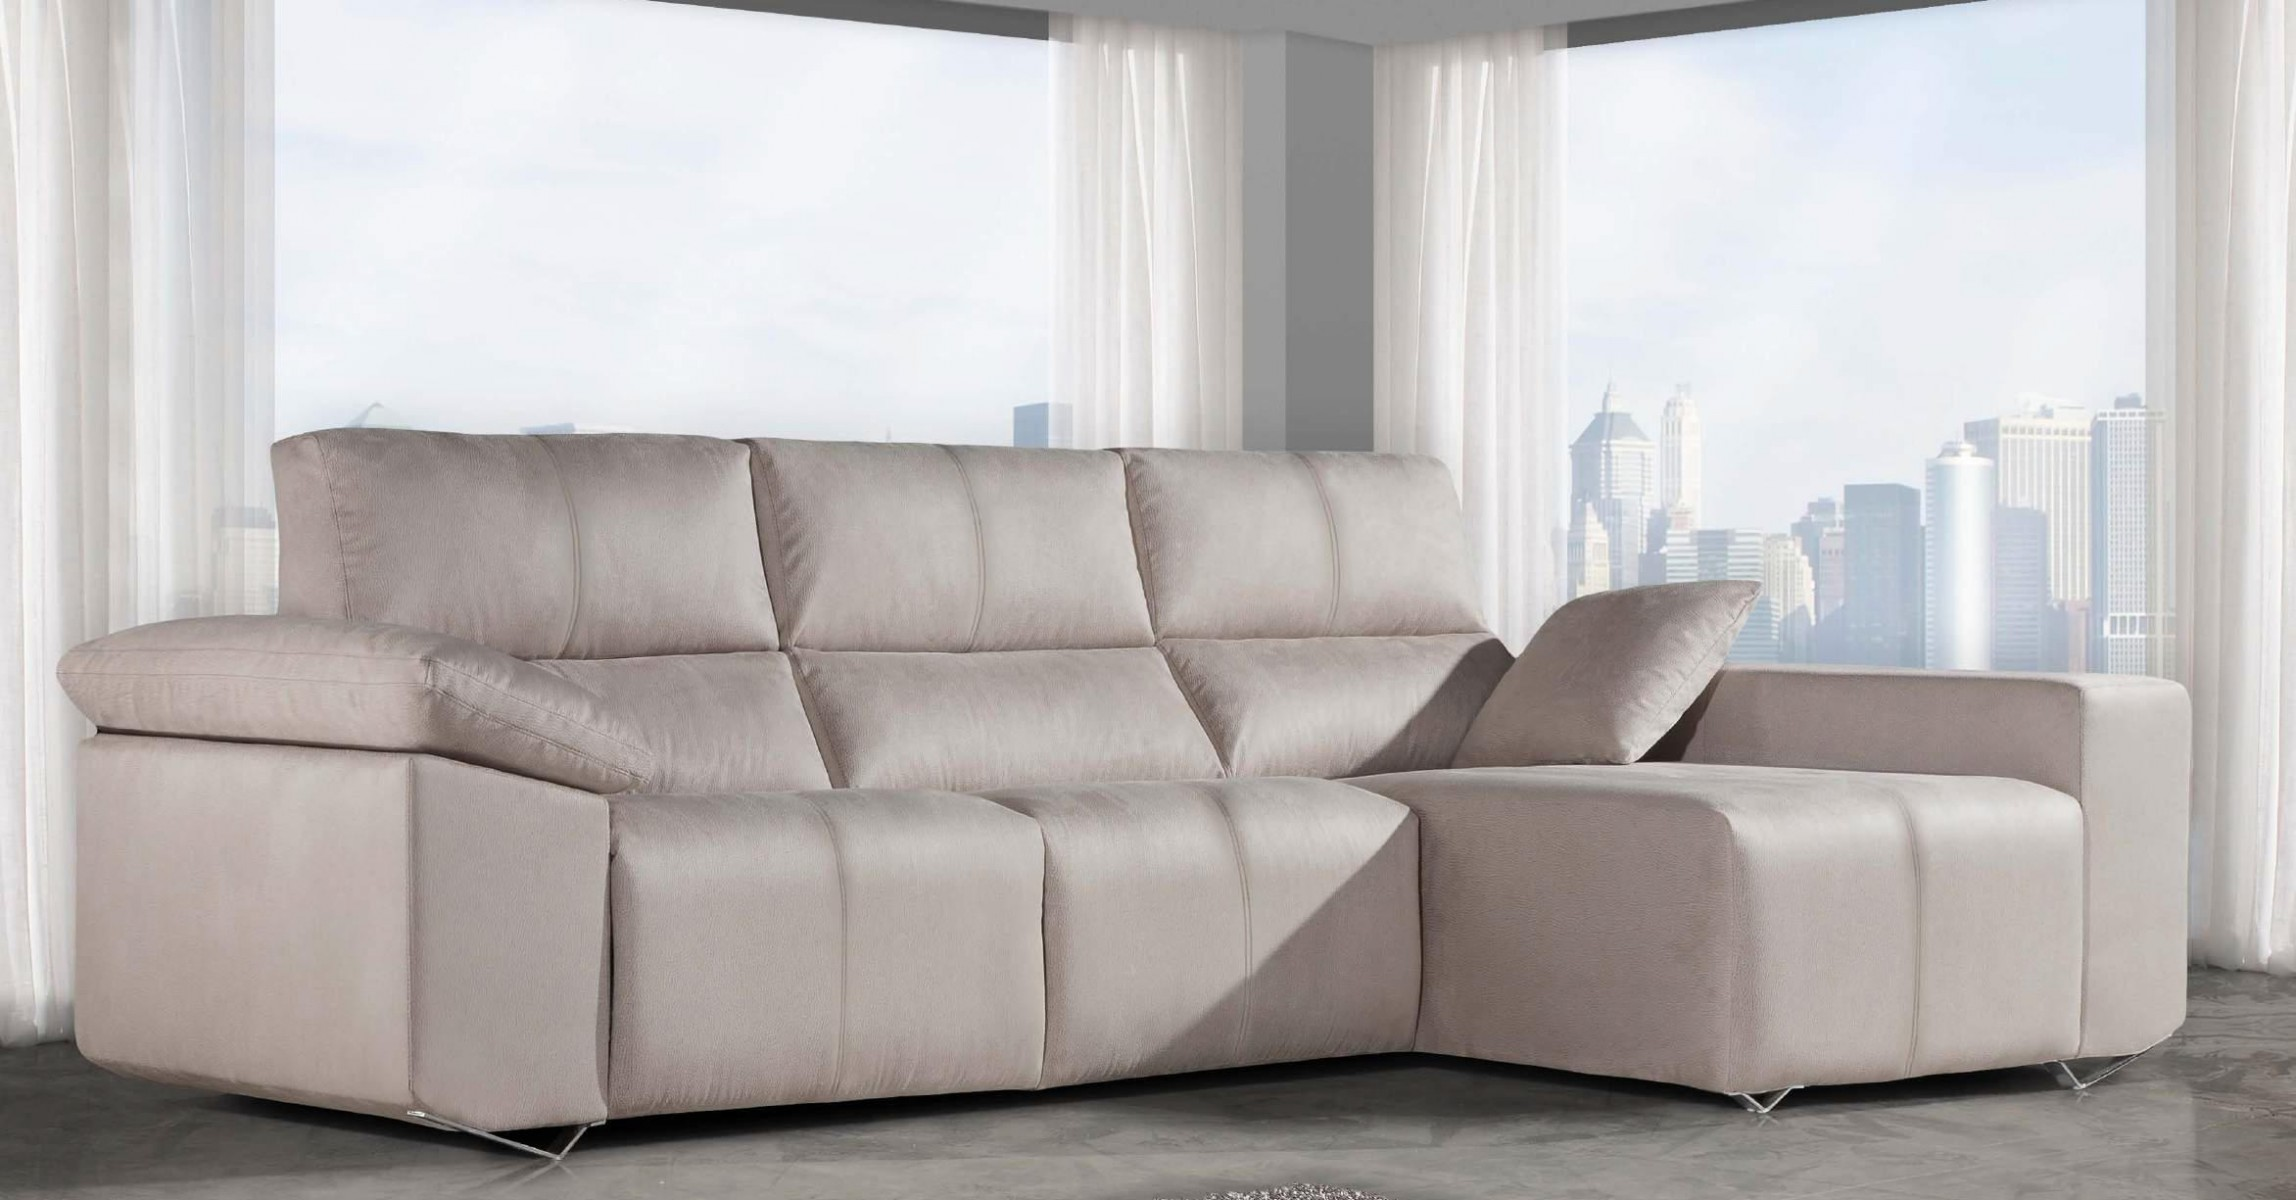 Sof s con chaise longue sof s modernos - Sofa con chaise ...